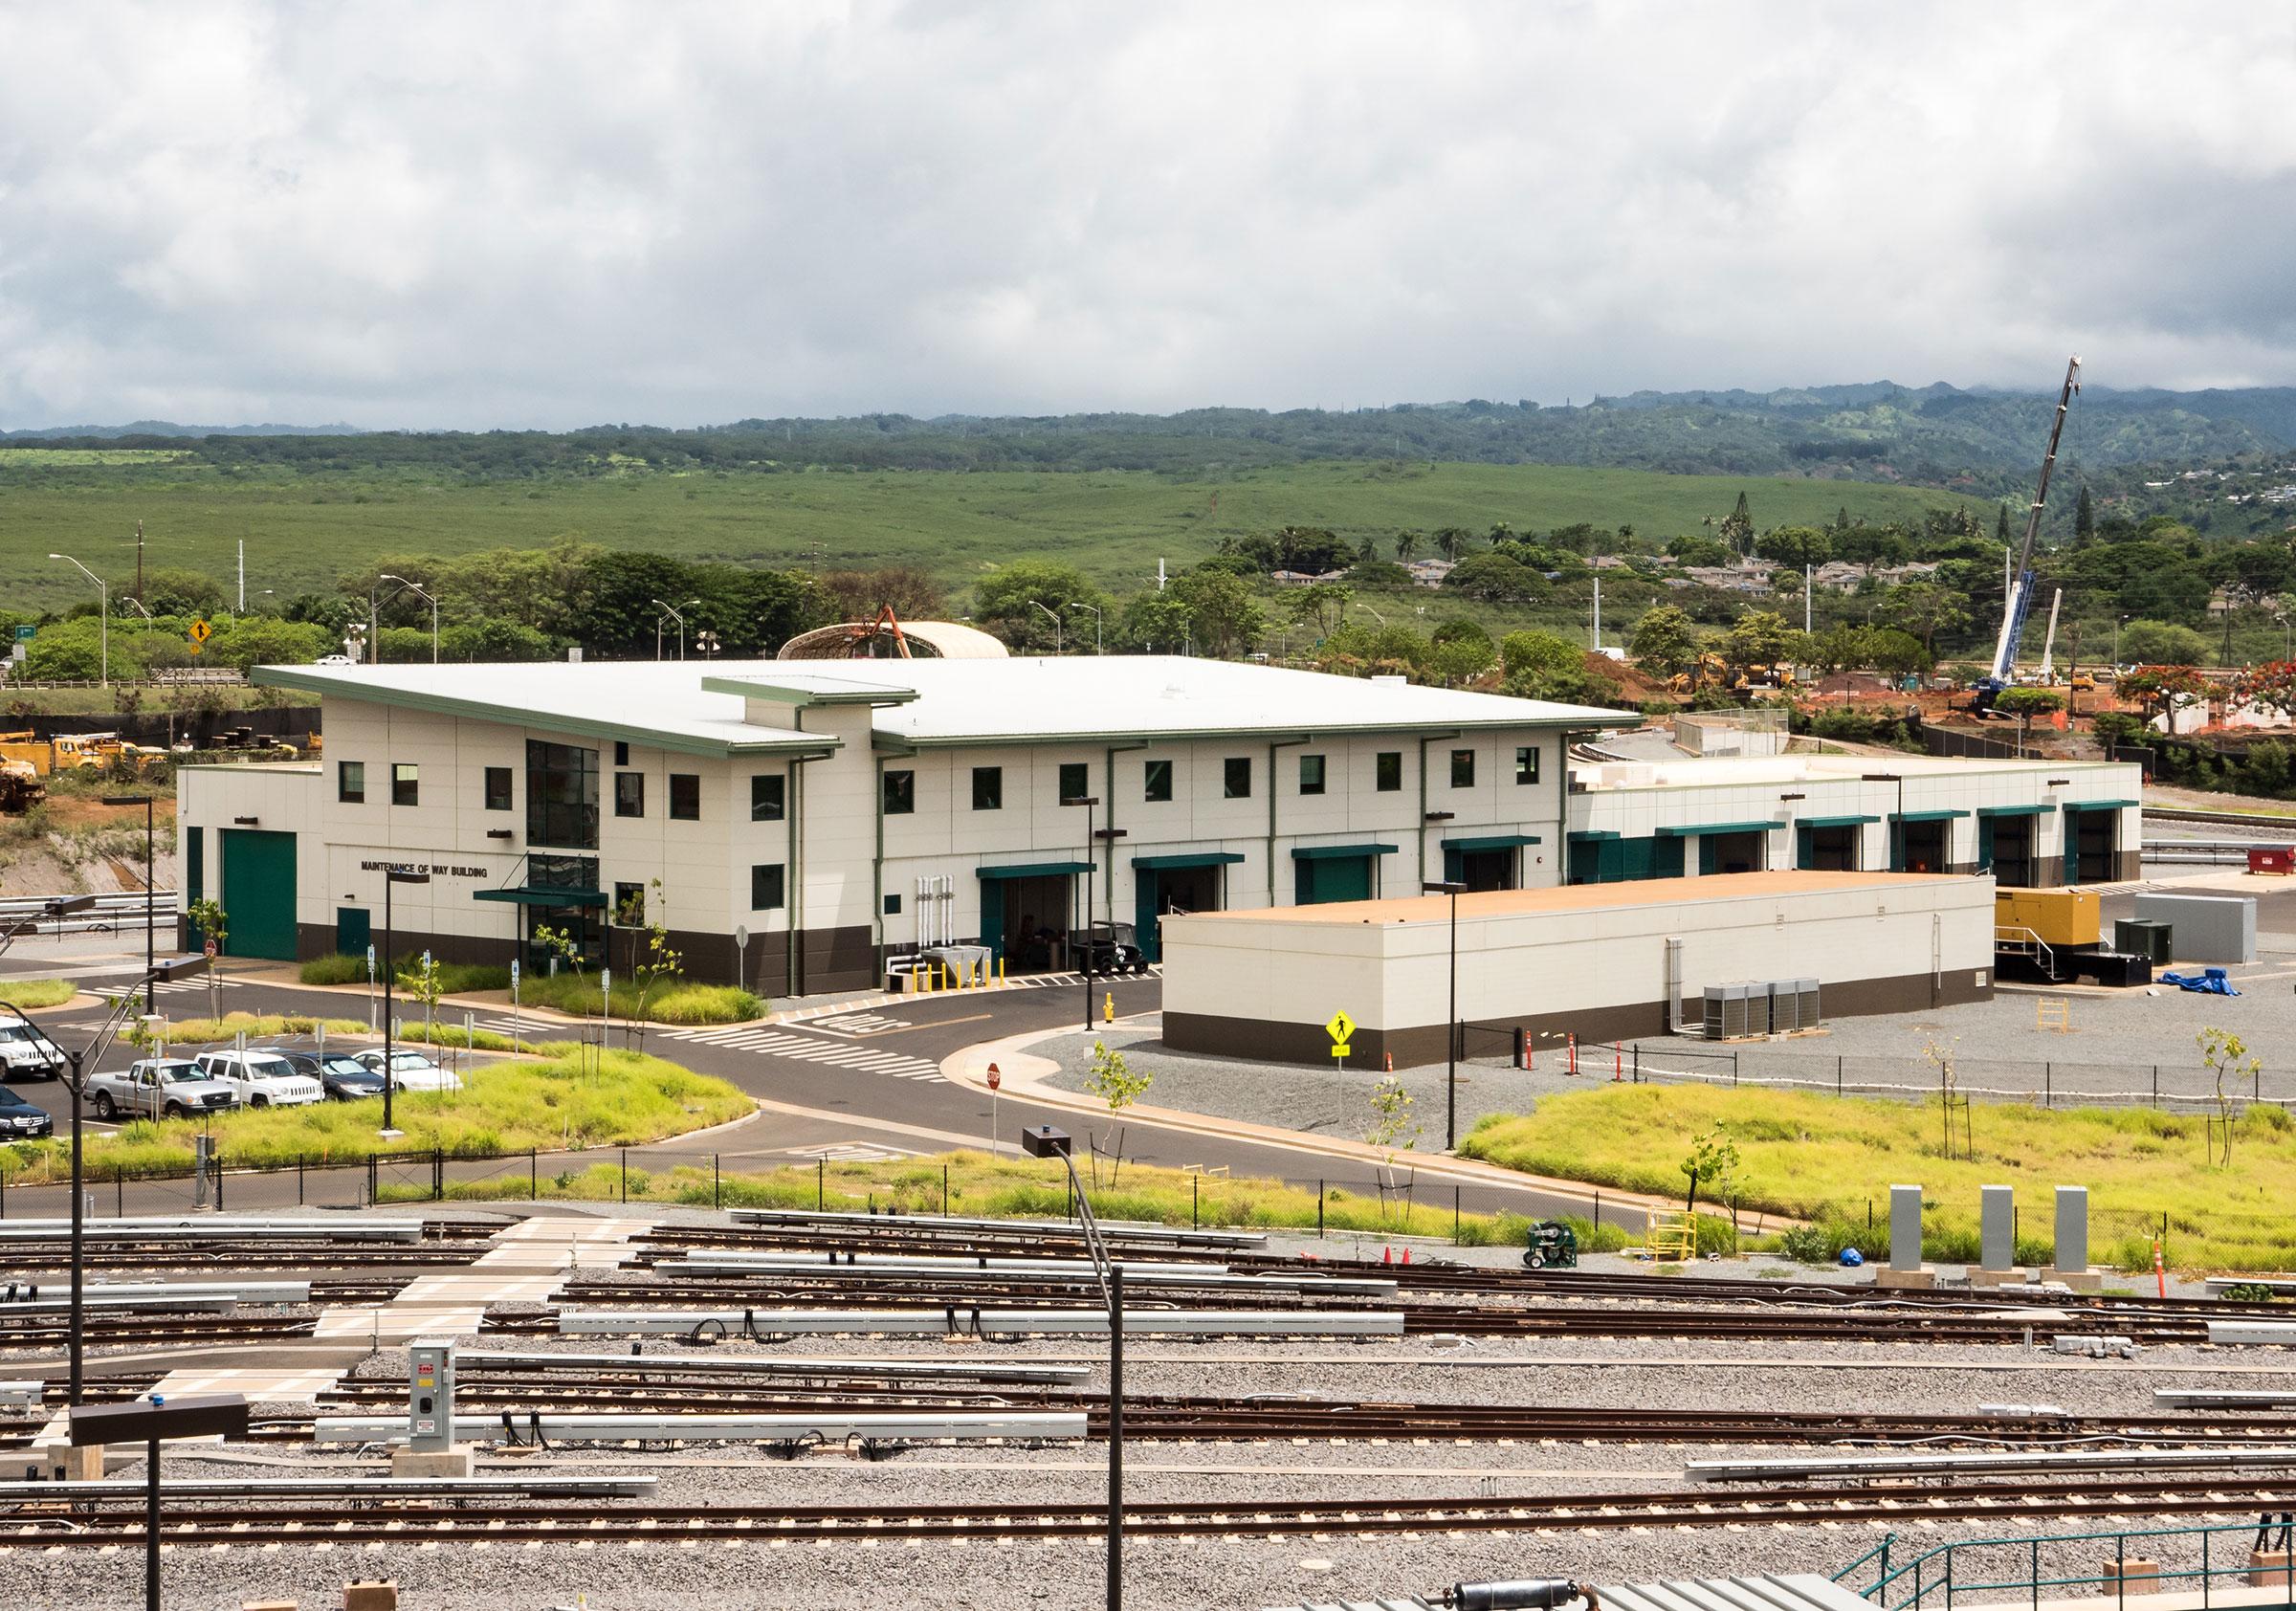 Honolulu Maintenance and Storage Facility